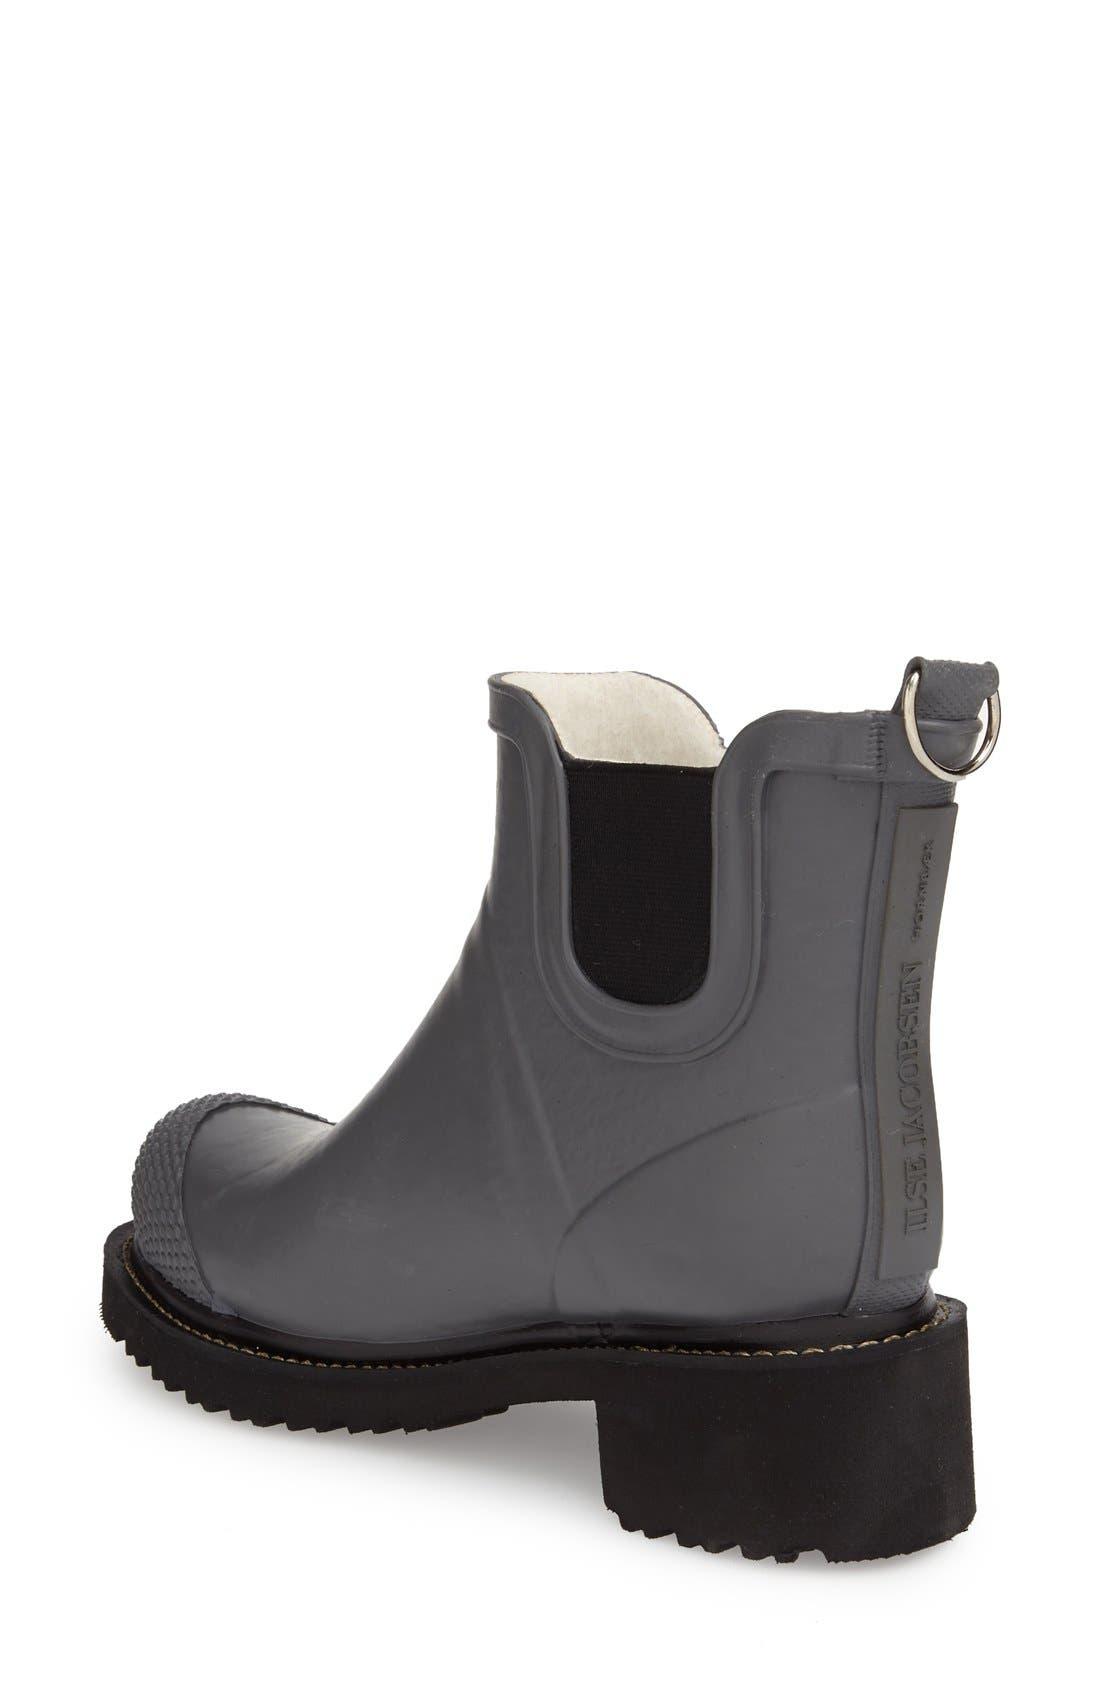 'RUB 47' Short Waterproof Rain Boot,                             Alternate thumbnail 2, color,                             GREY